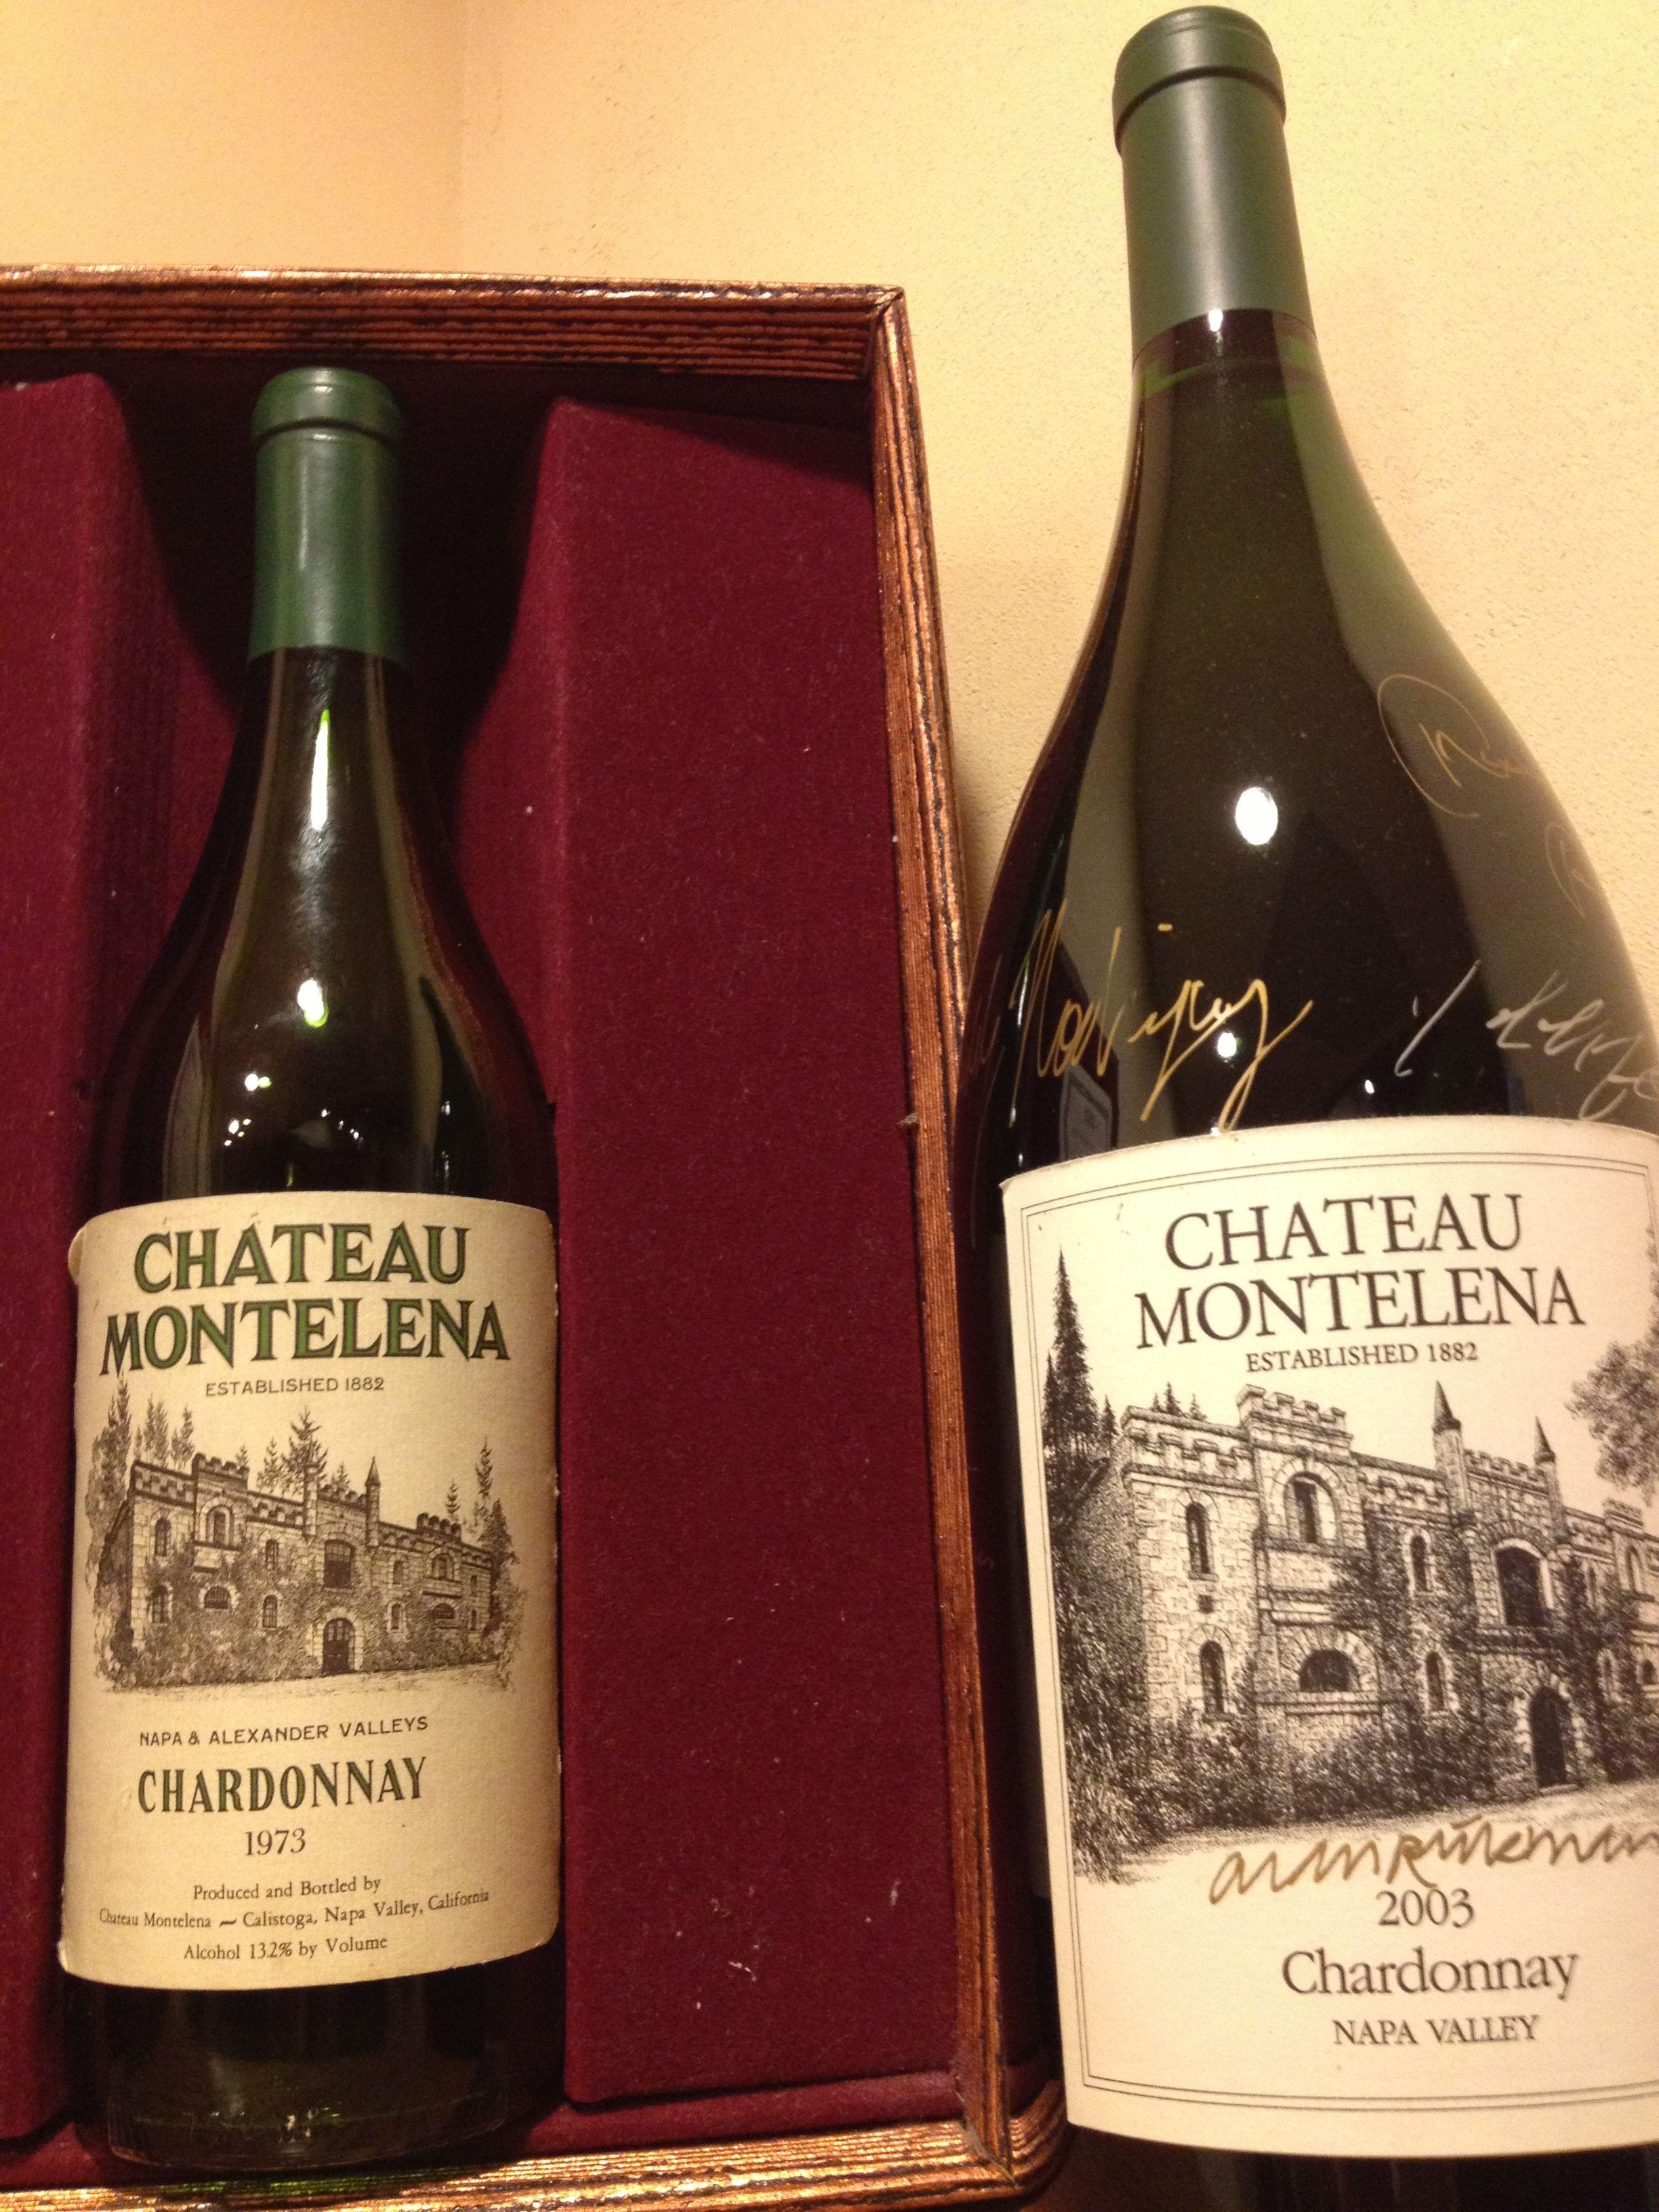 Chateau Montelena Winning Bottle From 1973 Paris Blind Tasting